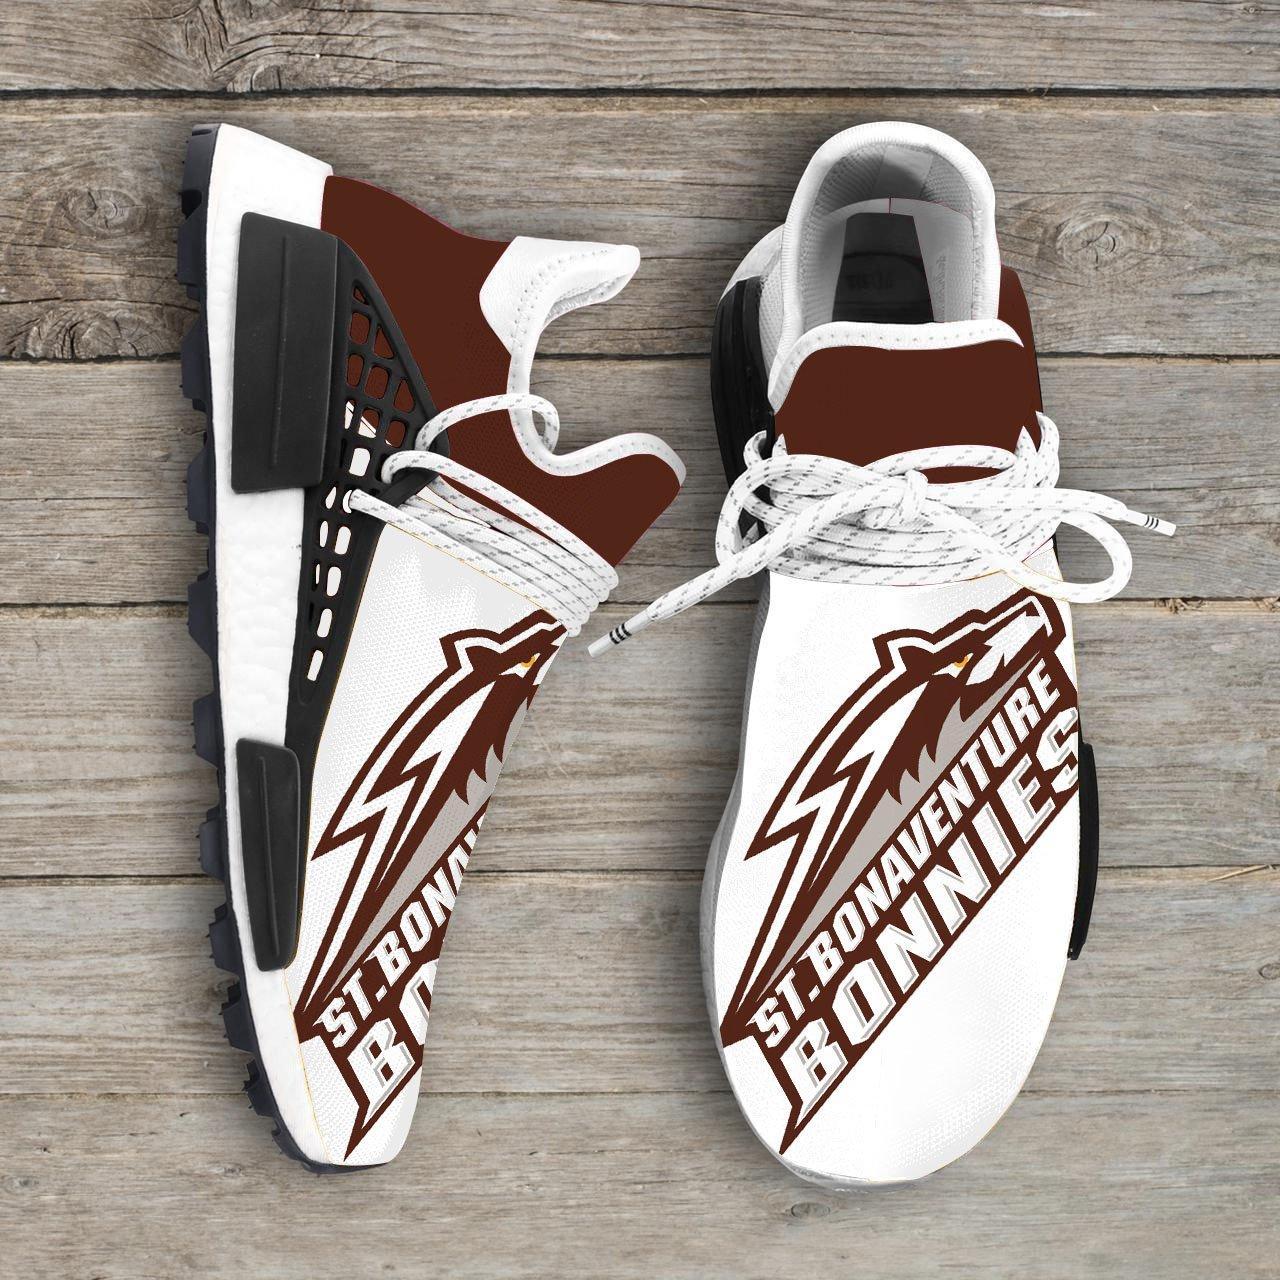 St. Bonaventure Bonnies Ncaa NMD Human Shoes